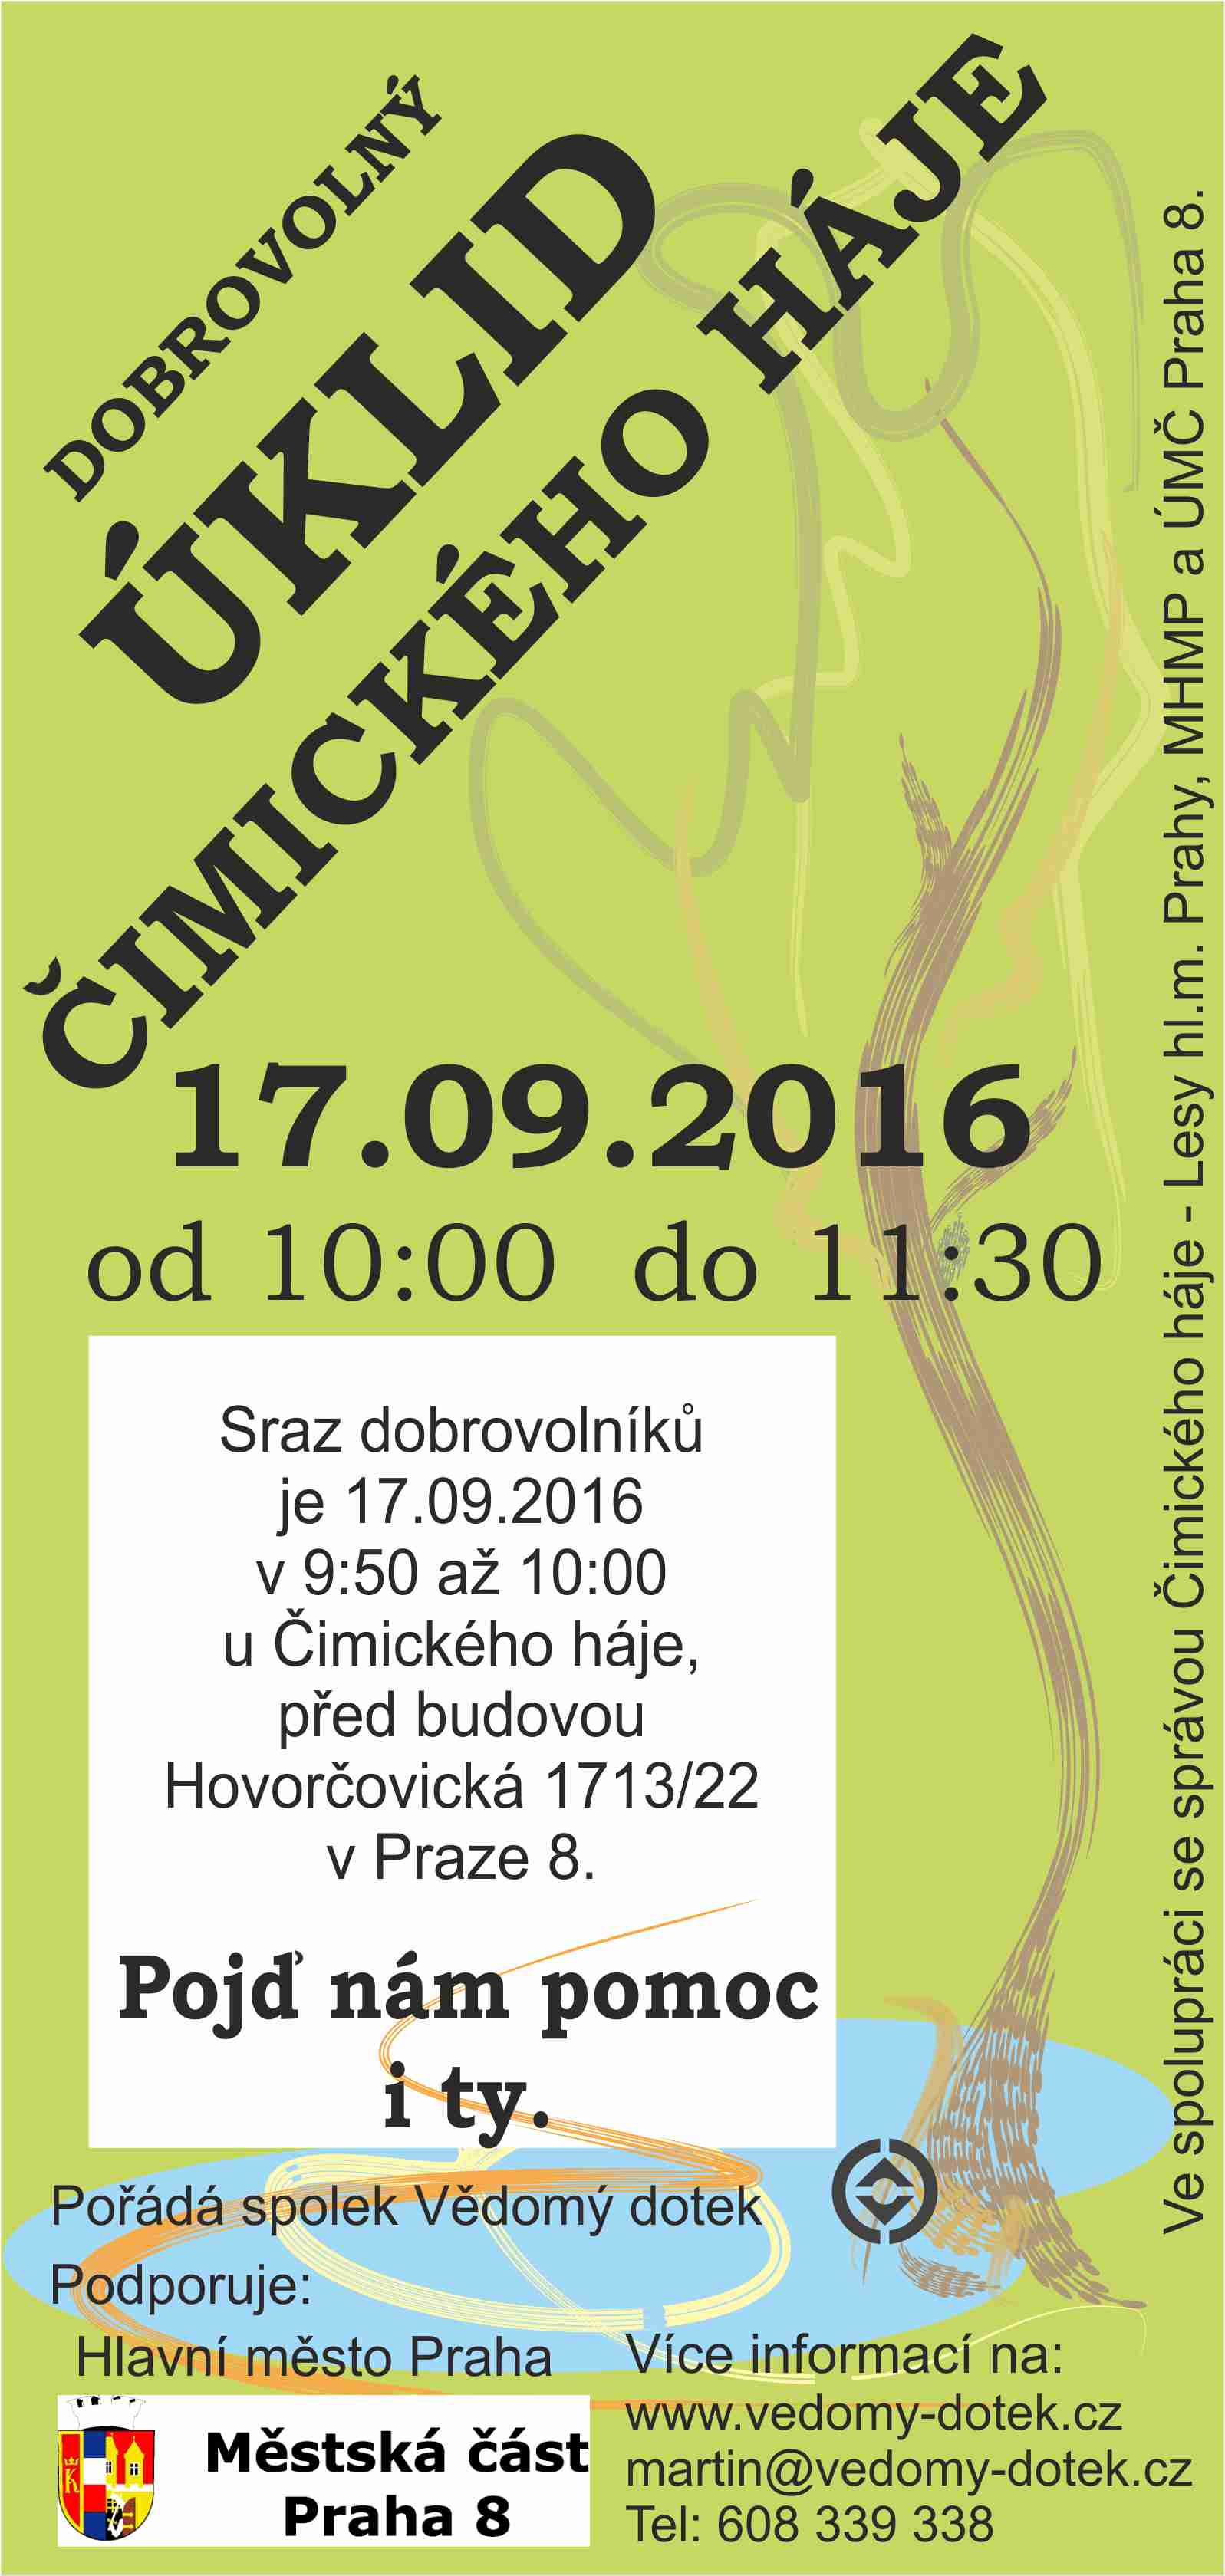 uklid-cimickeho-haje-podzim2016